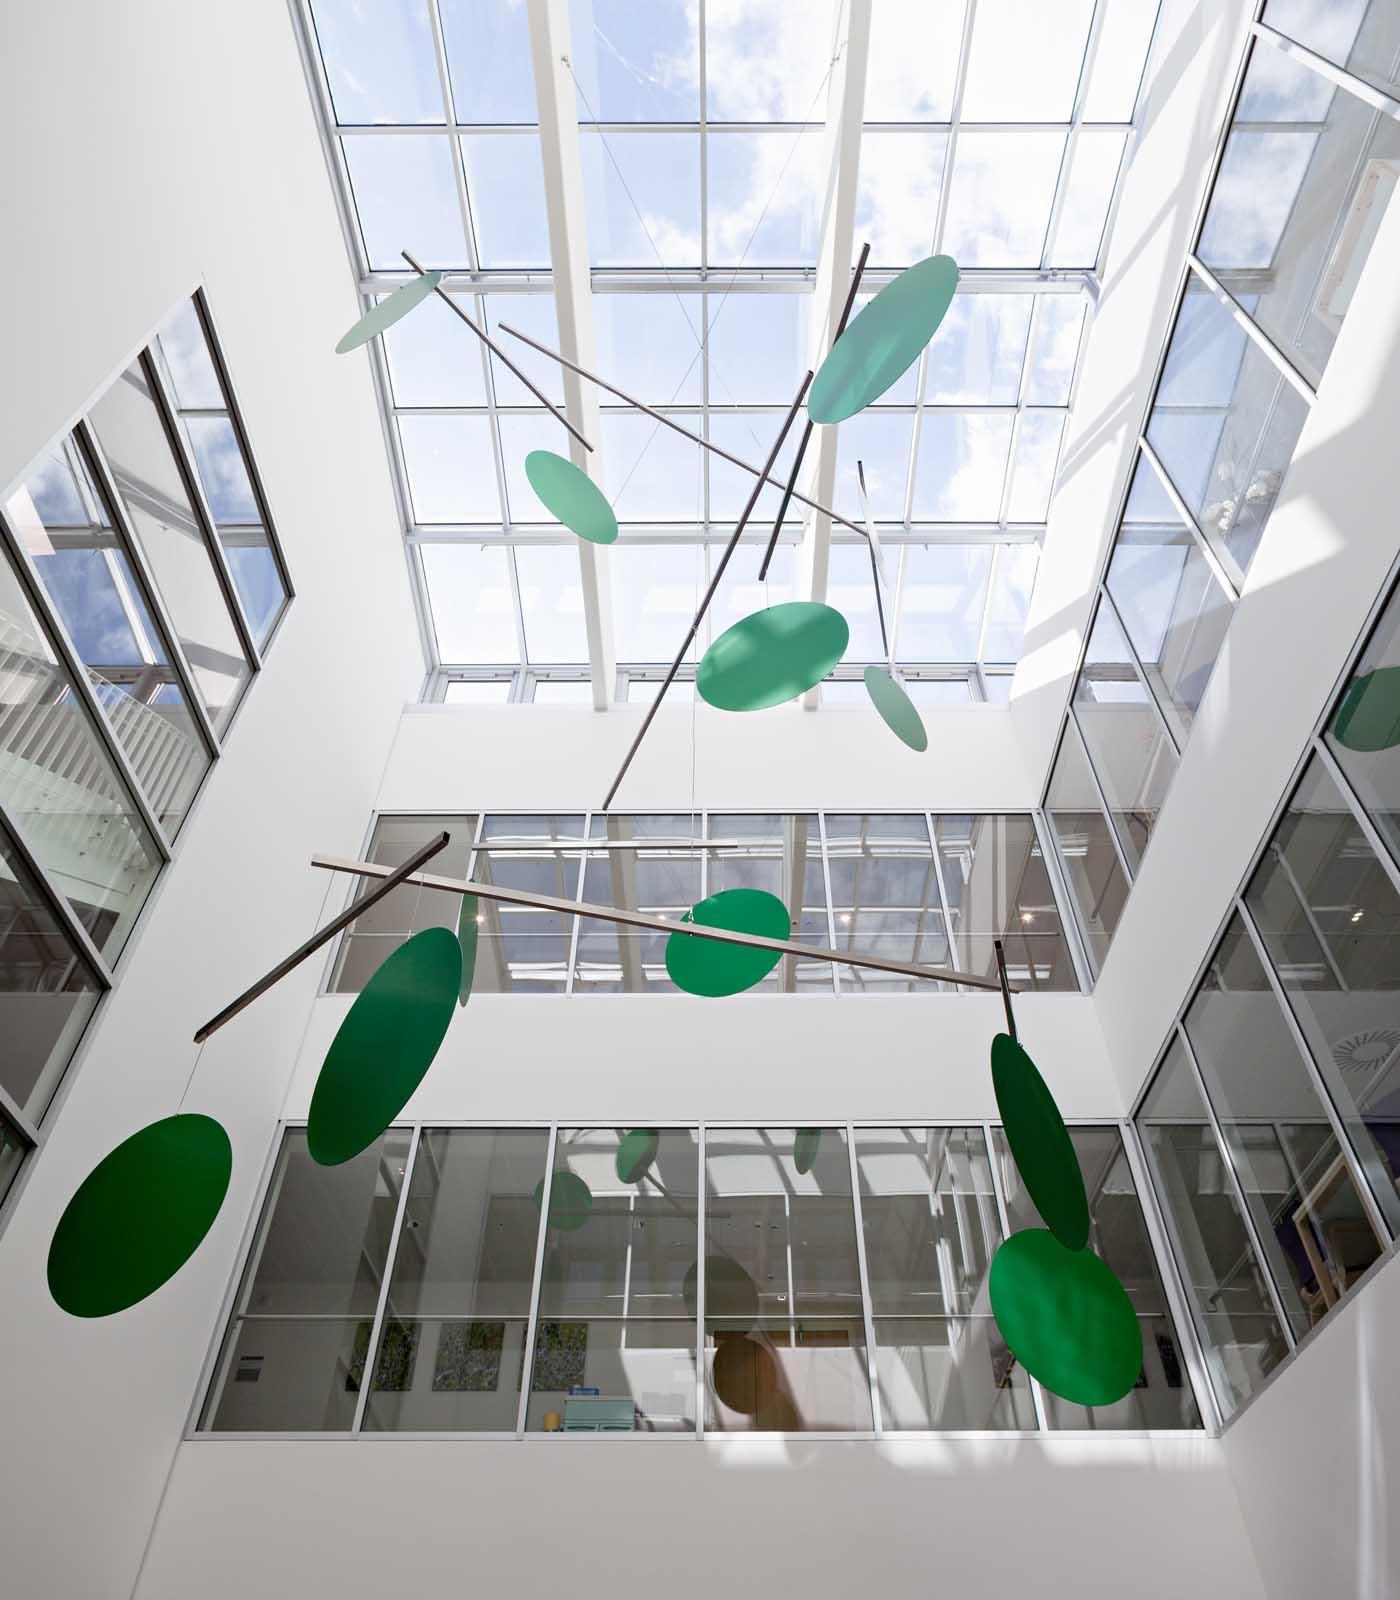 Kinetische Skulptur, Christoph Hinterhuber